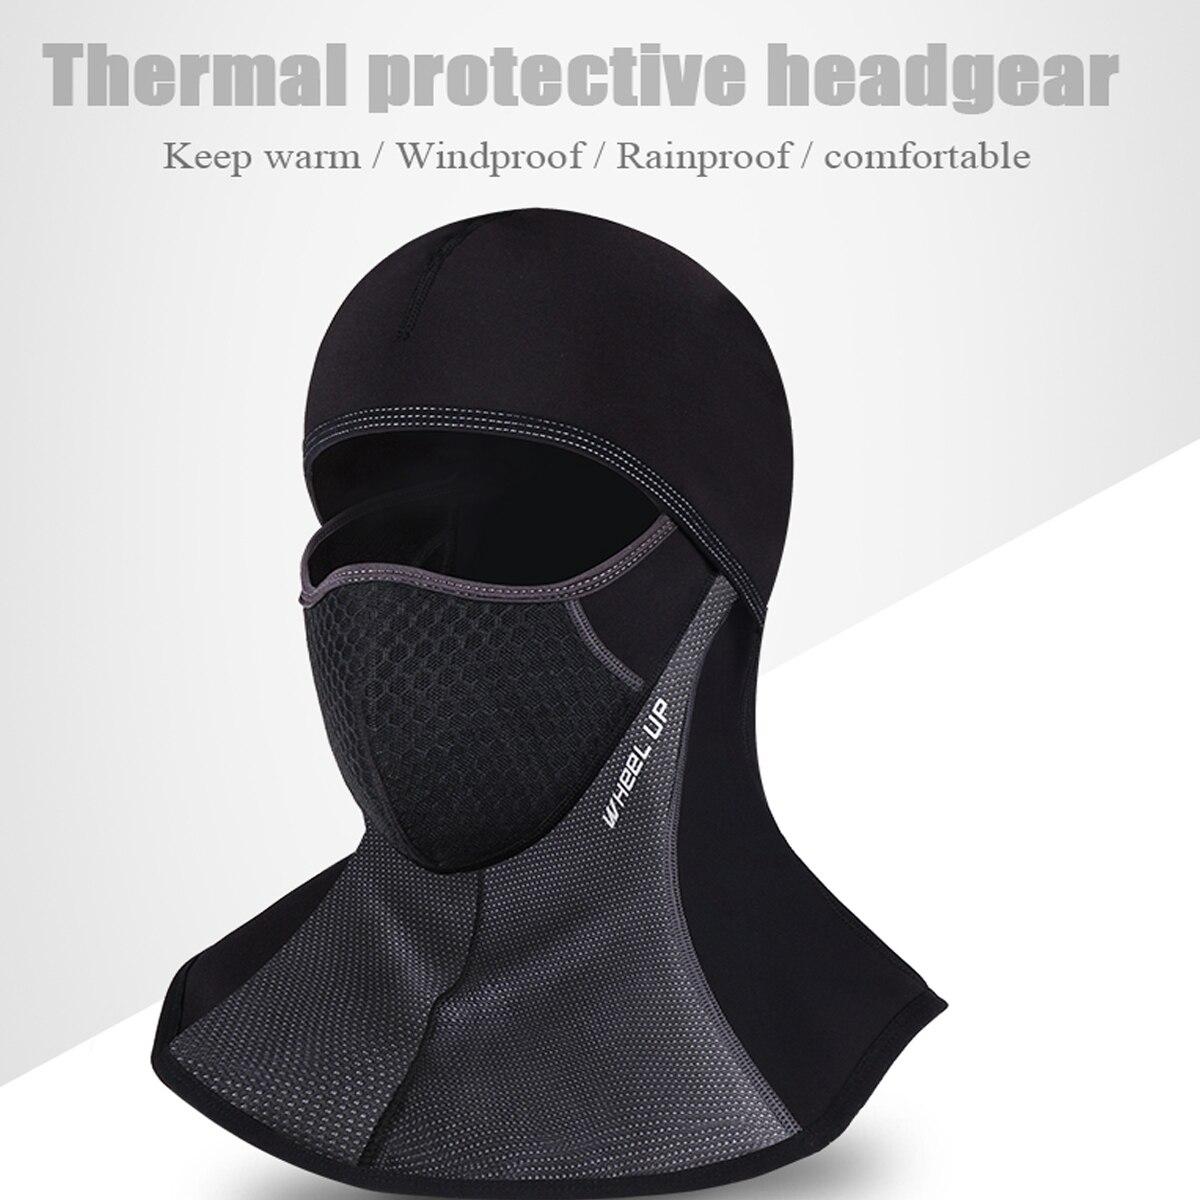 moto ciclismo máscara protetora capacete boné à